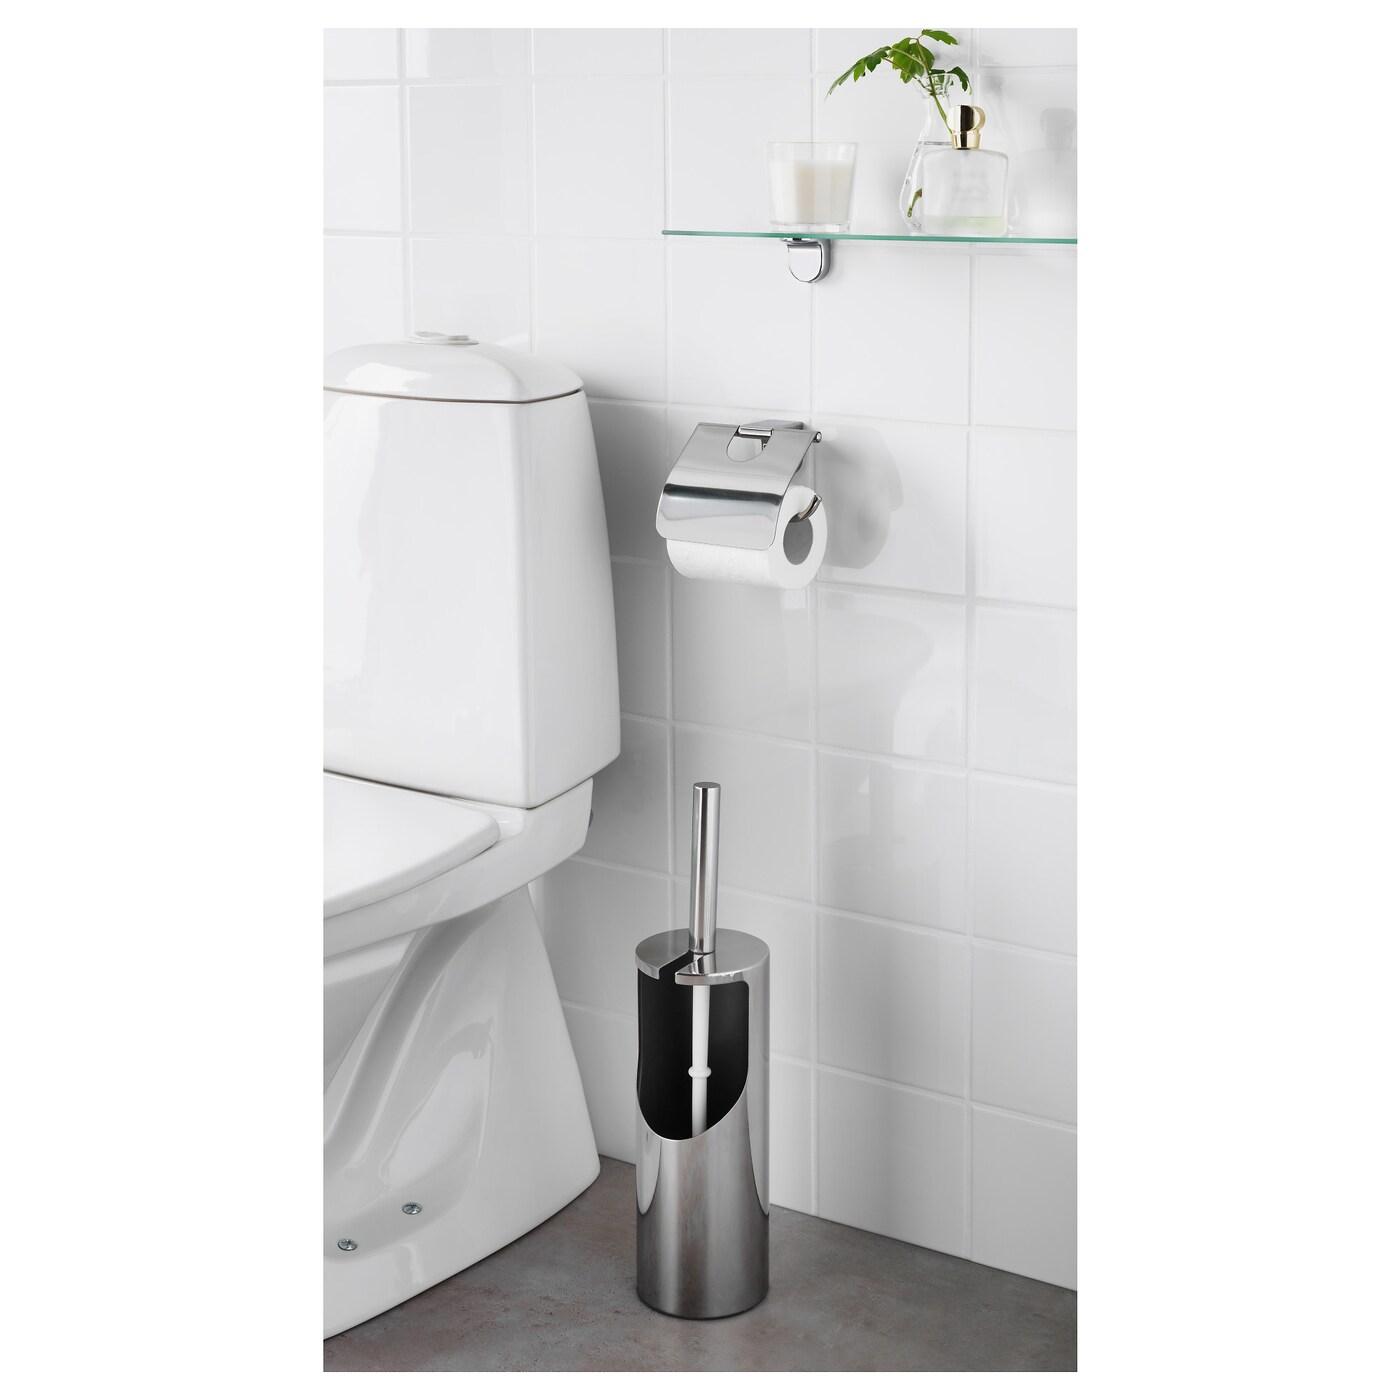 Kalkgrund porte rouleau wc chrom ikea for Porte rouleau wc